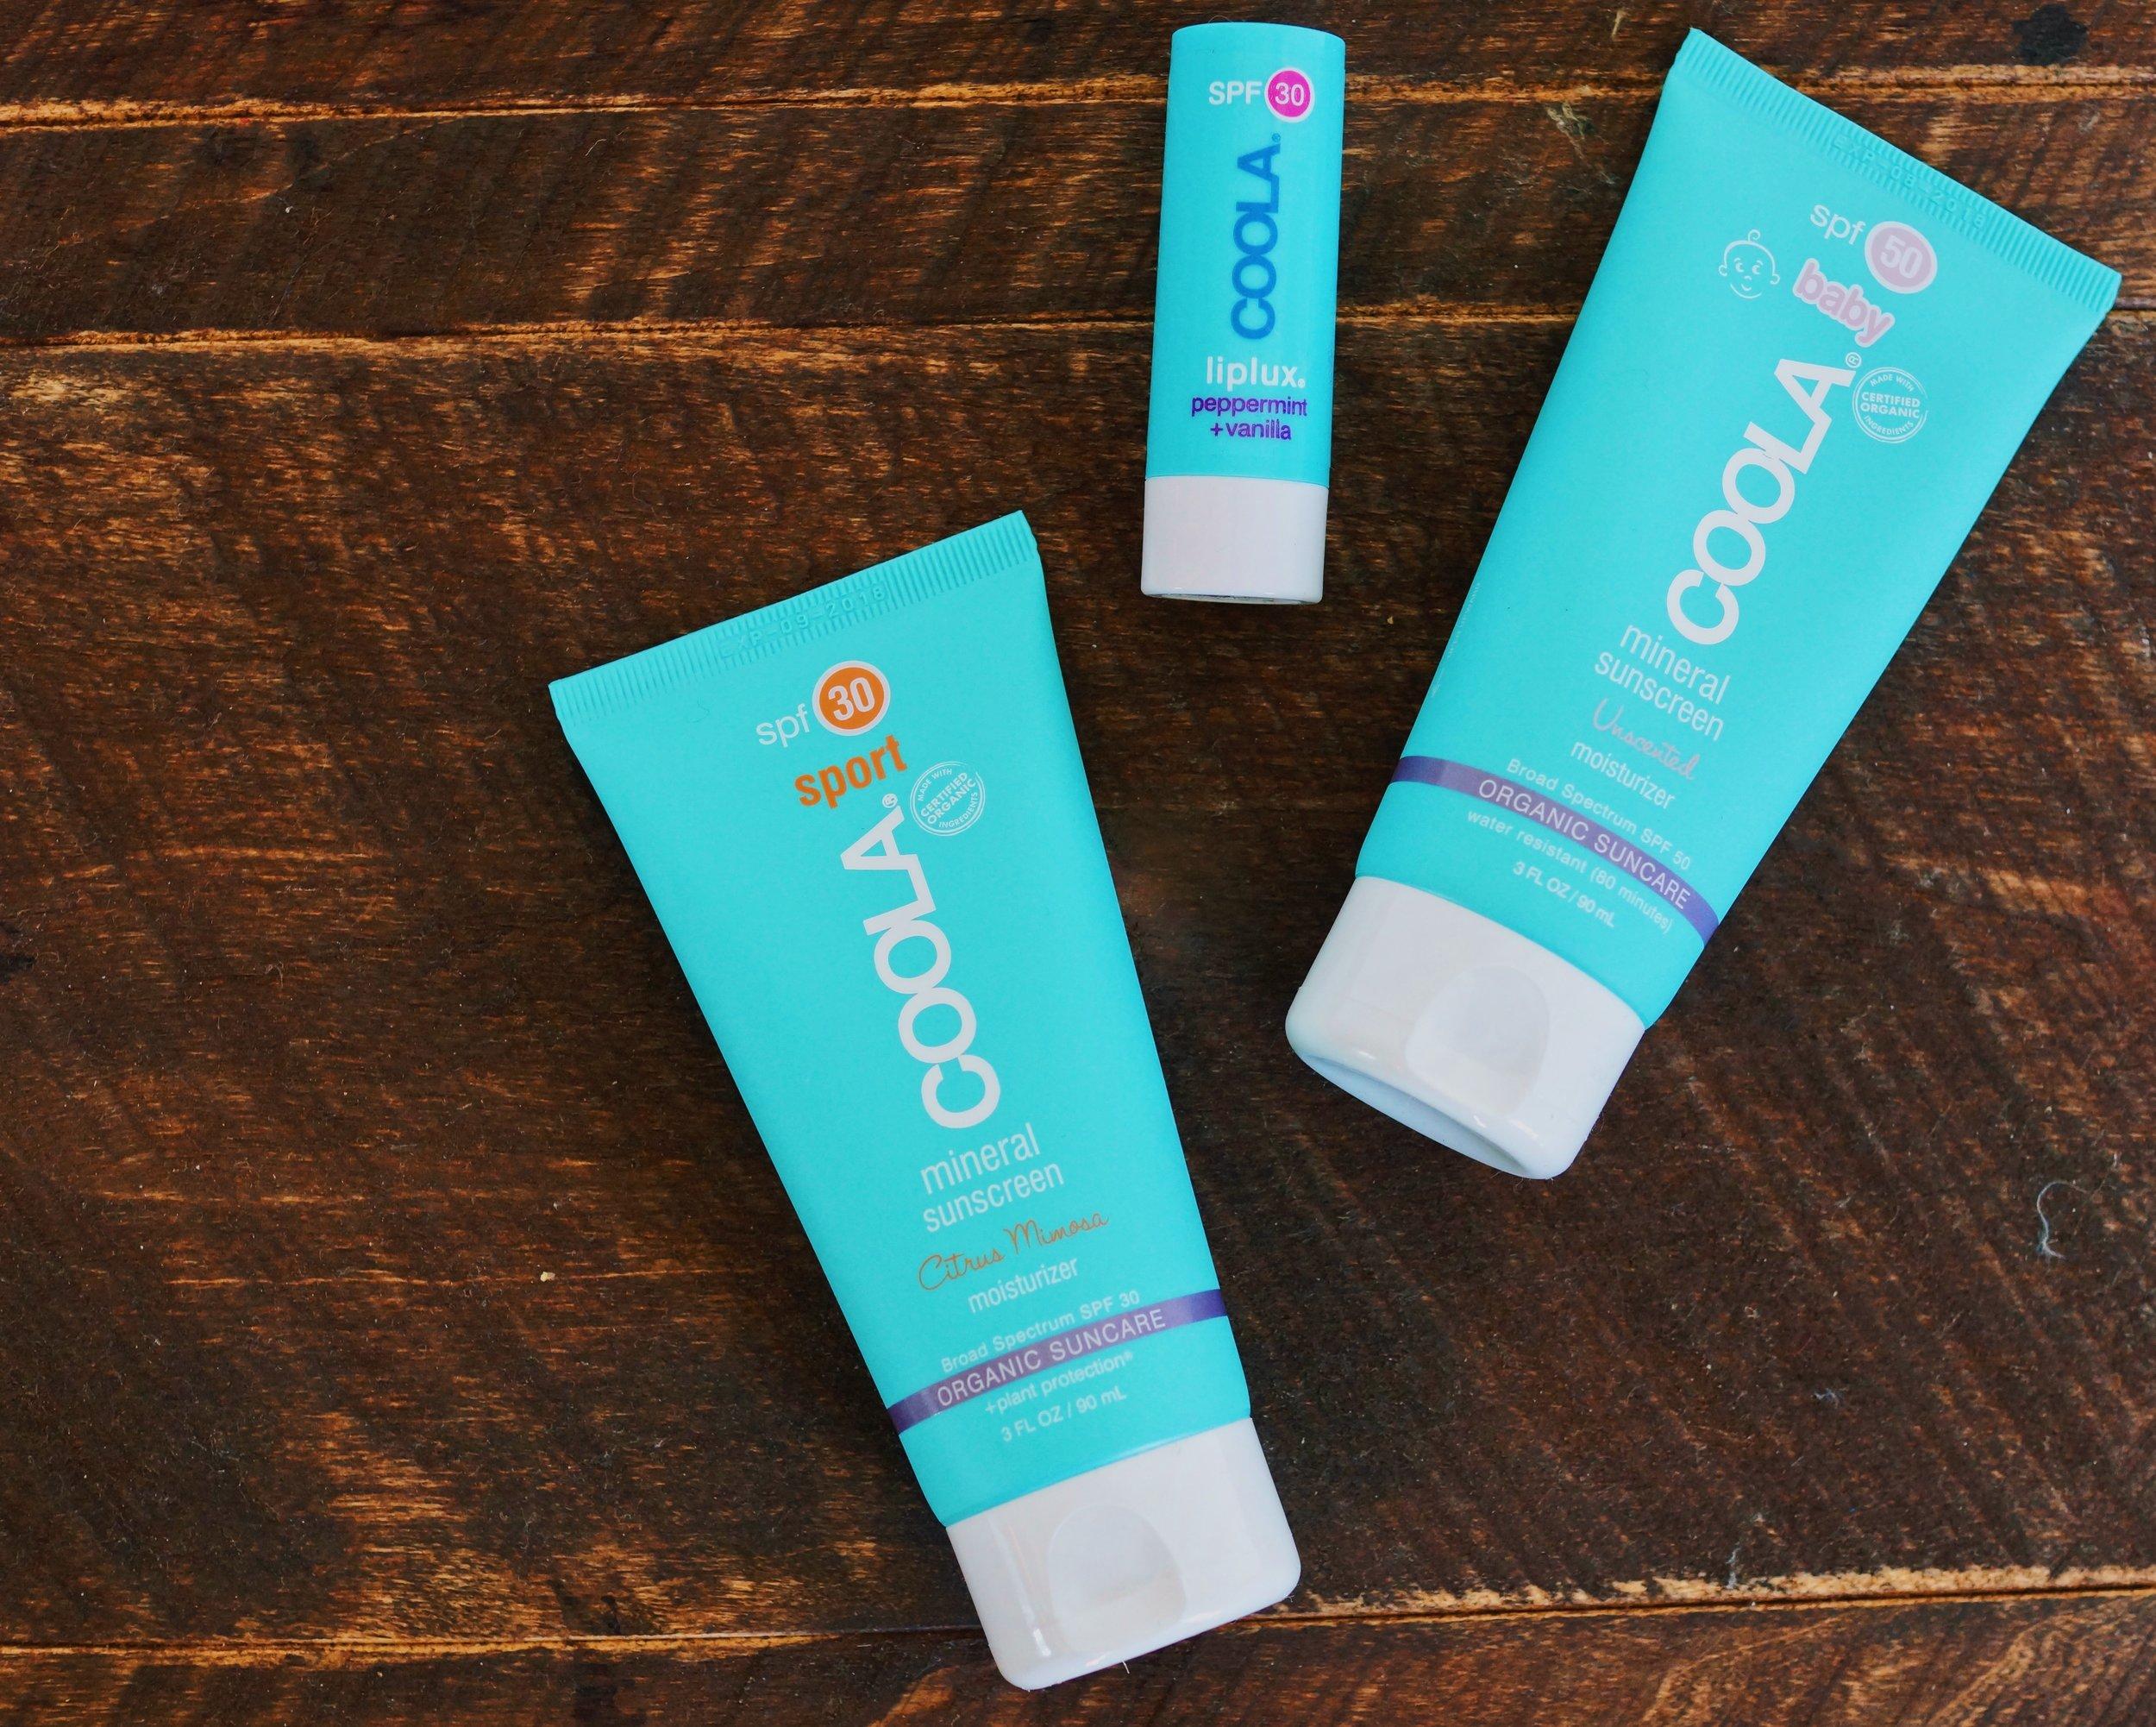 Coola_Three_Products.JPG